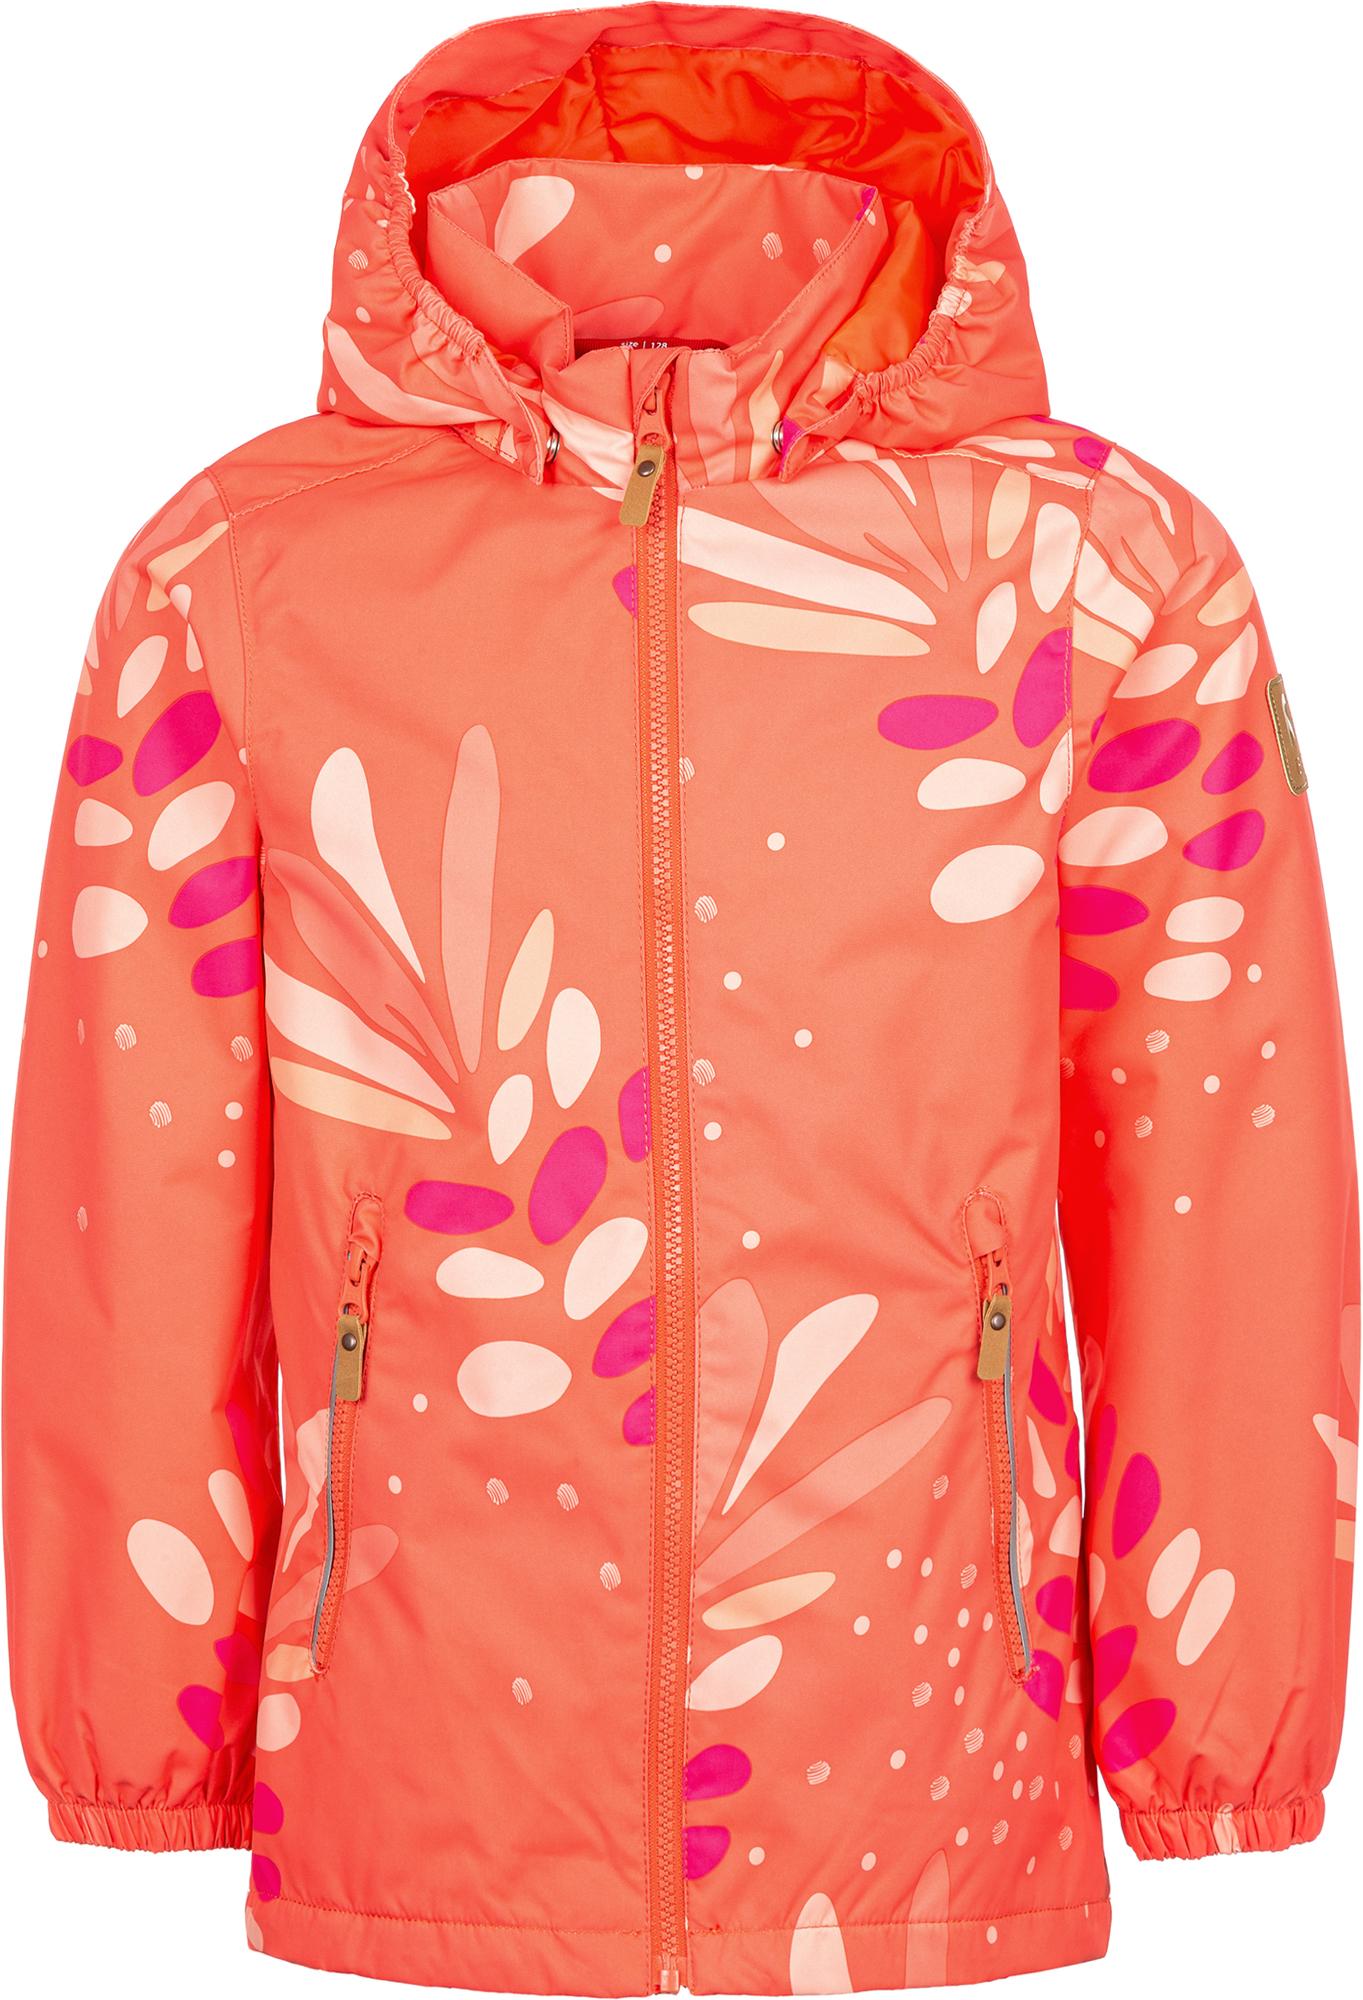 Reima Куртка утепленная для девочек Reima Anise, размер 146 reima толстовка для девочек reima haiko размер 146